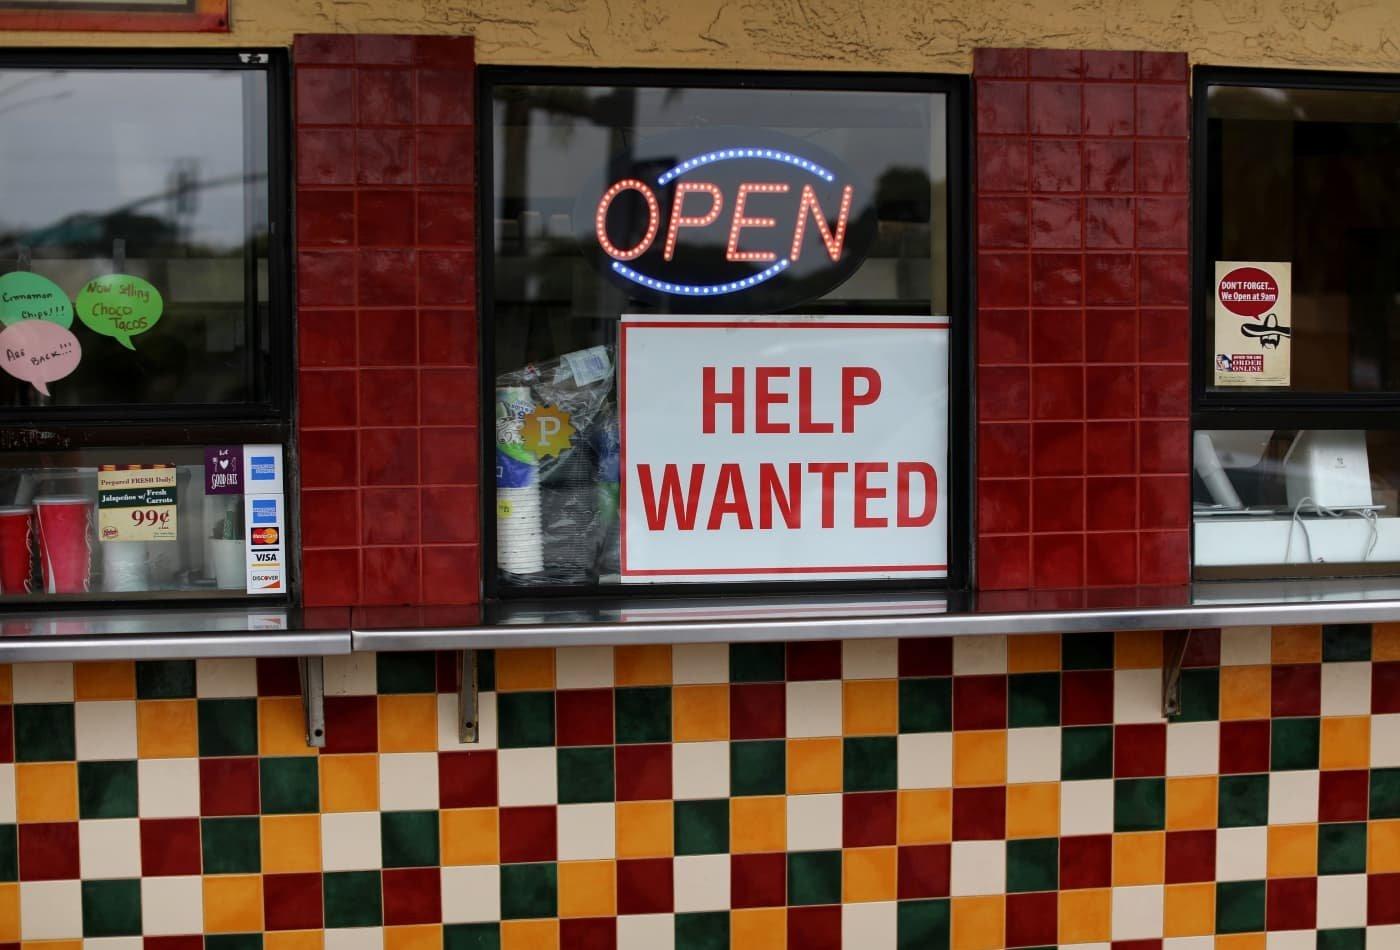 The U.S. job market is improving